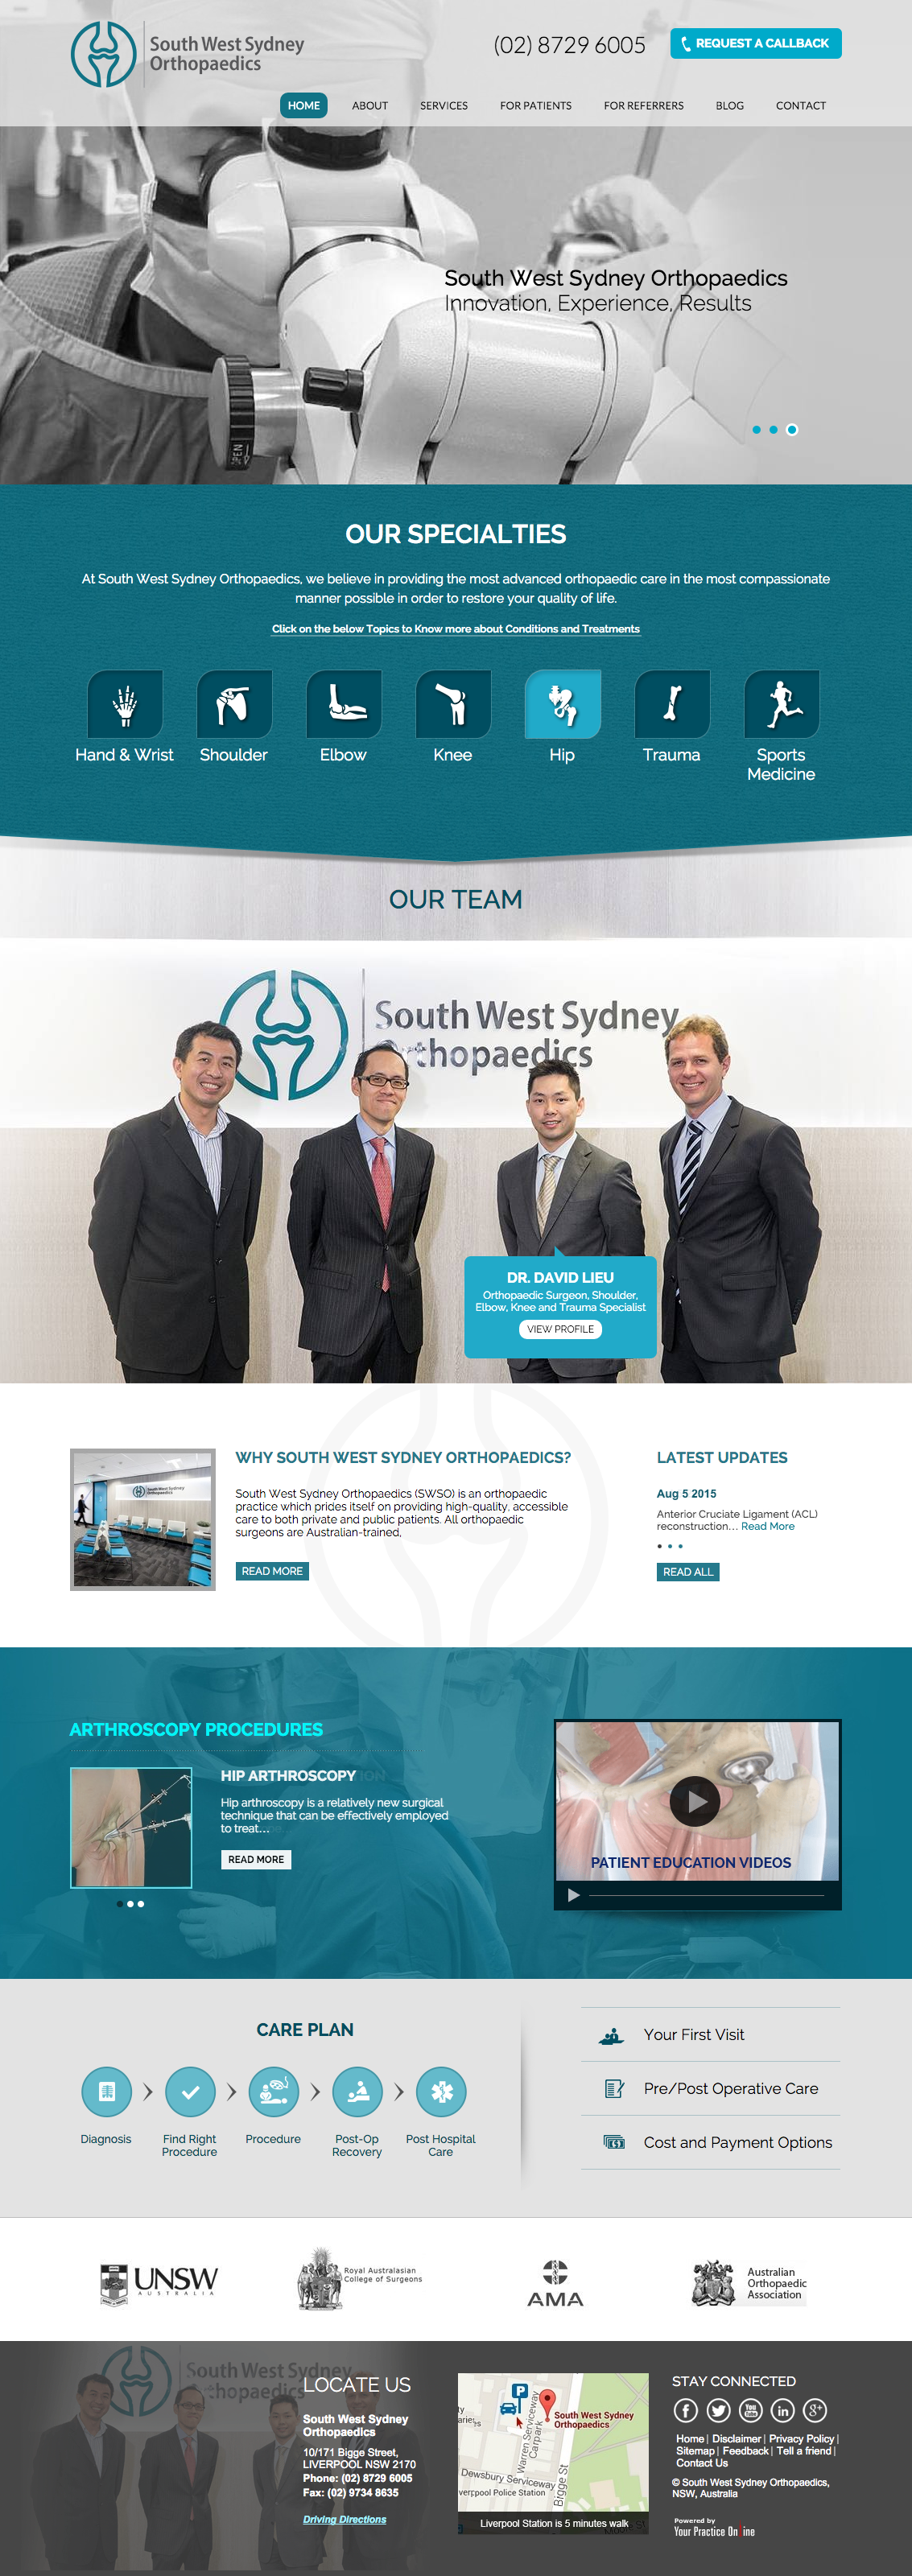 South West Sydney Orthopaedics  NSW  Australia.png